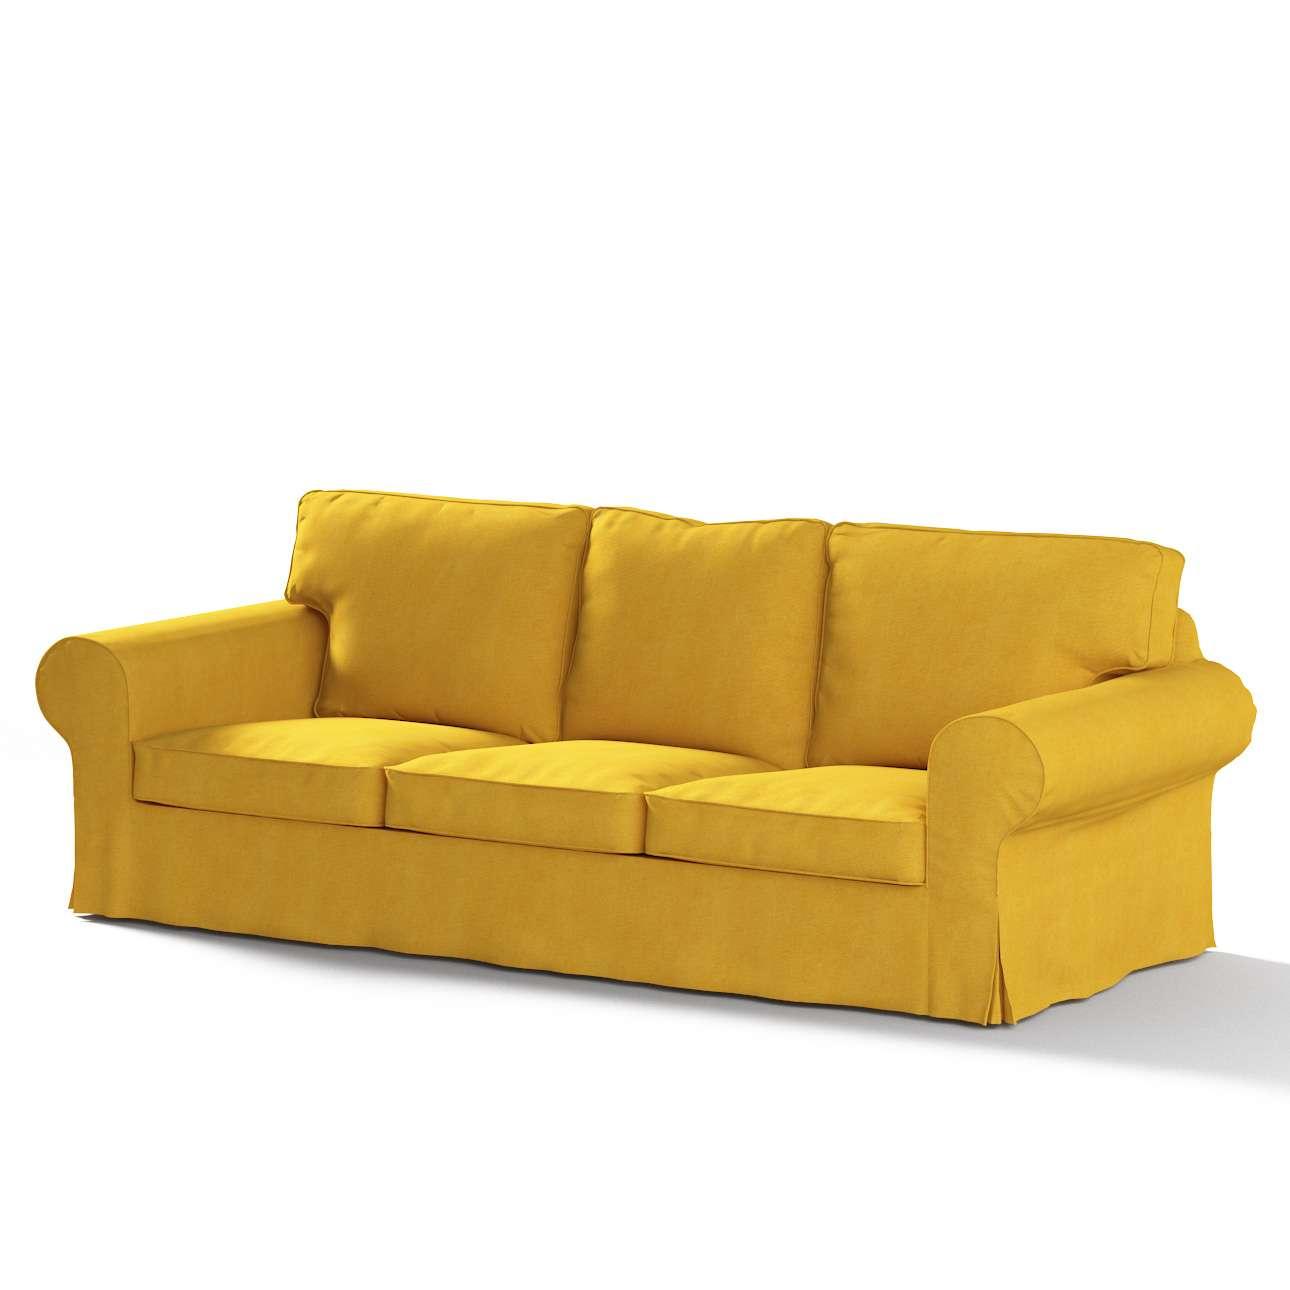 Ektorp 3-Sitzer Schlafsofabezug, ALTES Modell Sofahusse Ektorp 3-Sitzer Schlafsofa von der Kollektion Etna, Stoff: 705-04